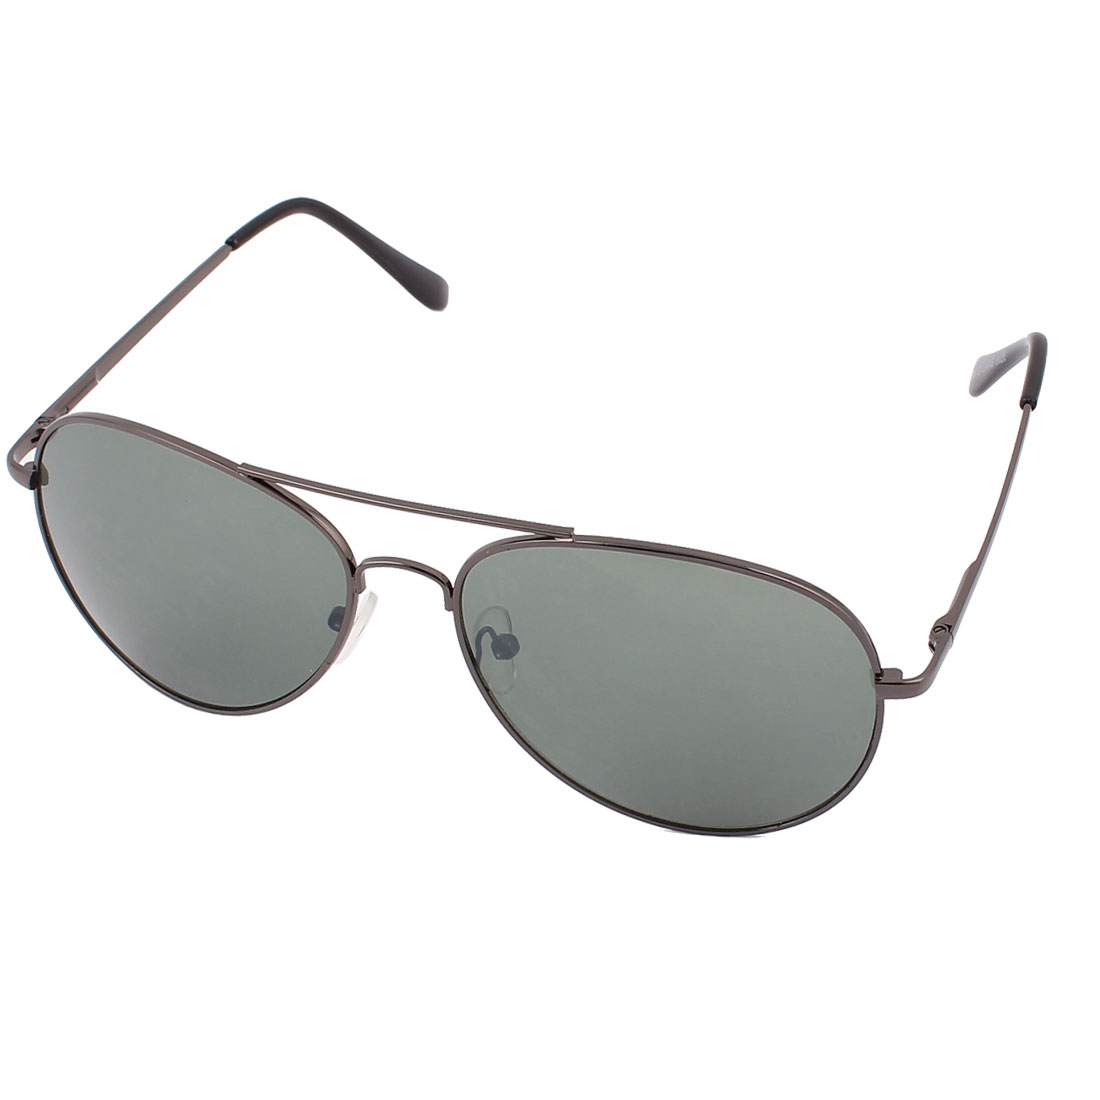 Men Outdoor Casual Double Bridge Metal Full Frame Dark Green Waterdrop Lens Sunglasses Eyewear Eye Protector Glasses